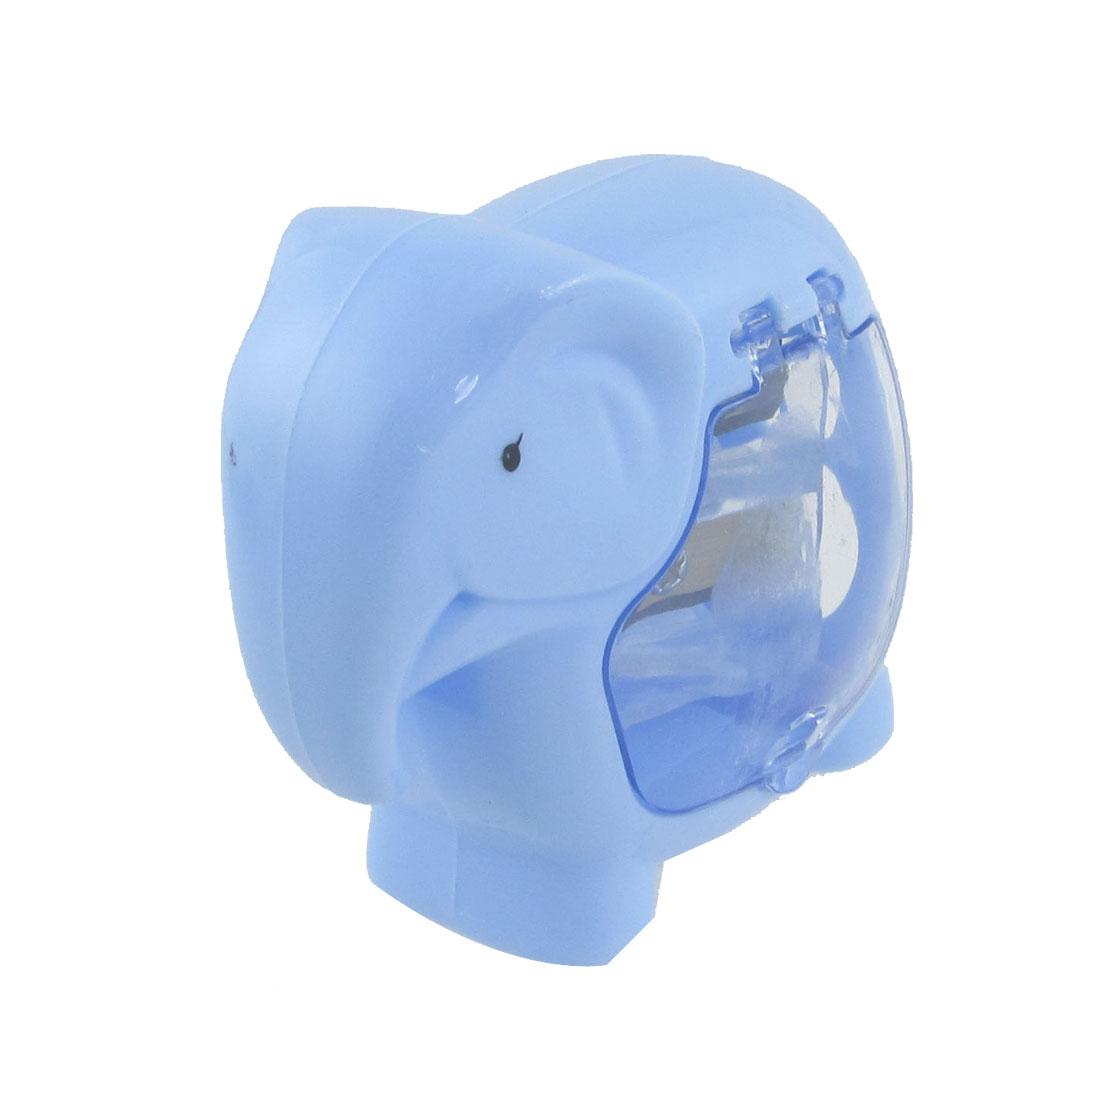 Blue Plastic Case Double Hole Elephant Shaped Pencil Sharpener